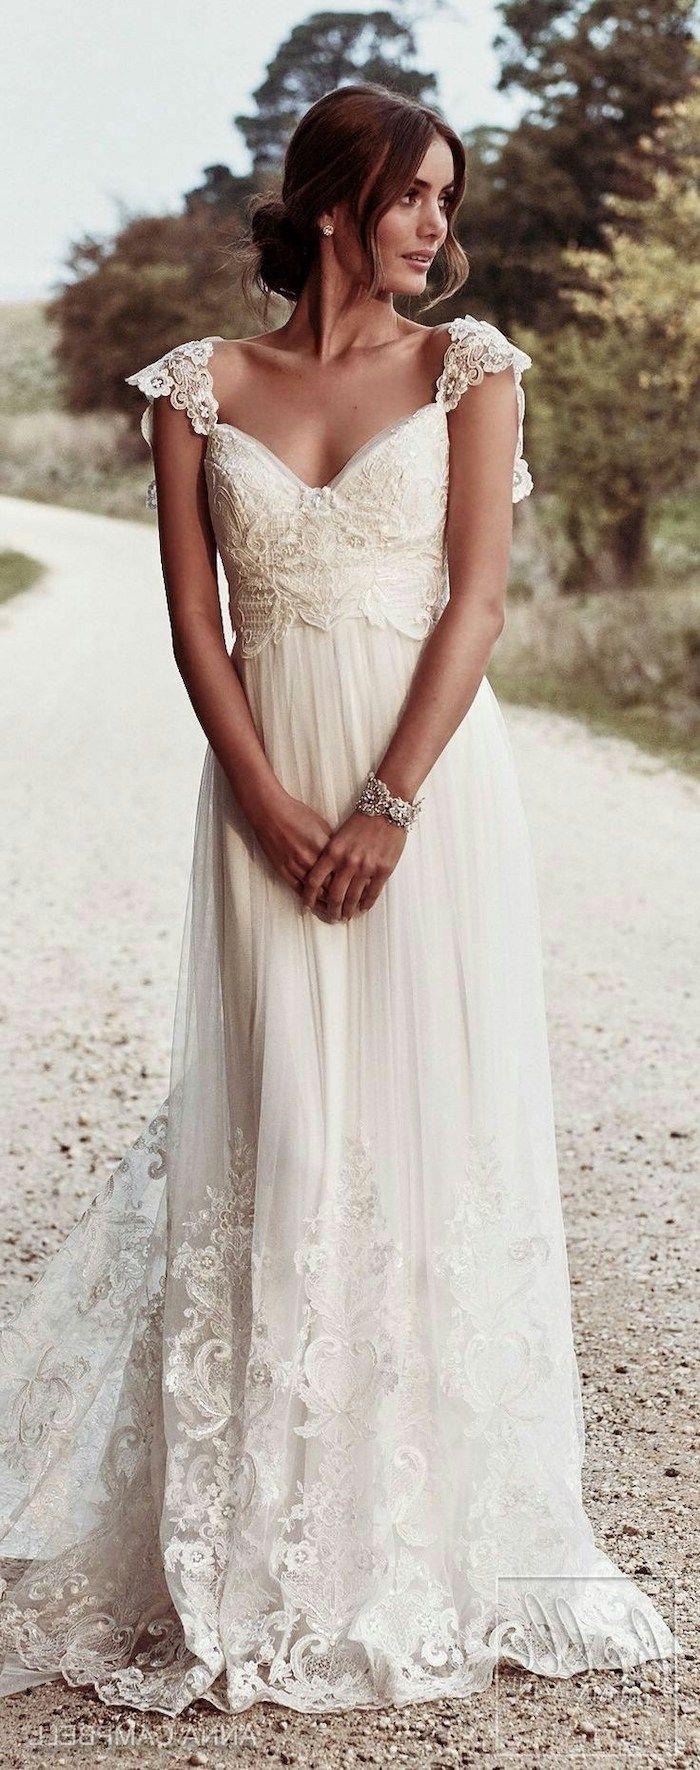 1001 Ideas For Stunning Beach Wedding Dresses Wedding Weddingdress Casual Beach Wedding Dress Wedding Dress Cap Sleeves Informal Wedding Dresses [ 1770 x 700 Pixel ]